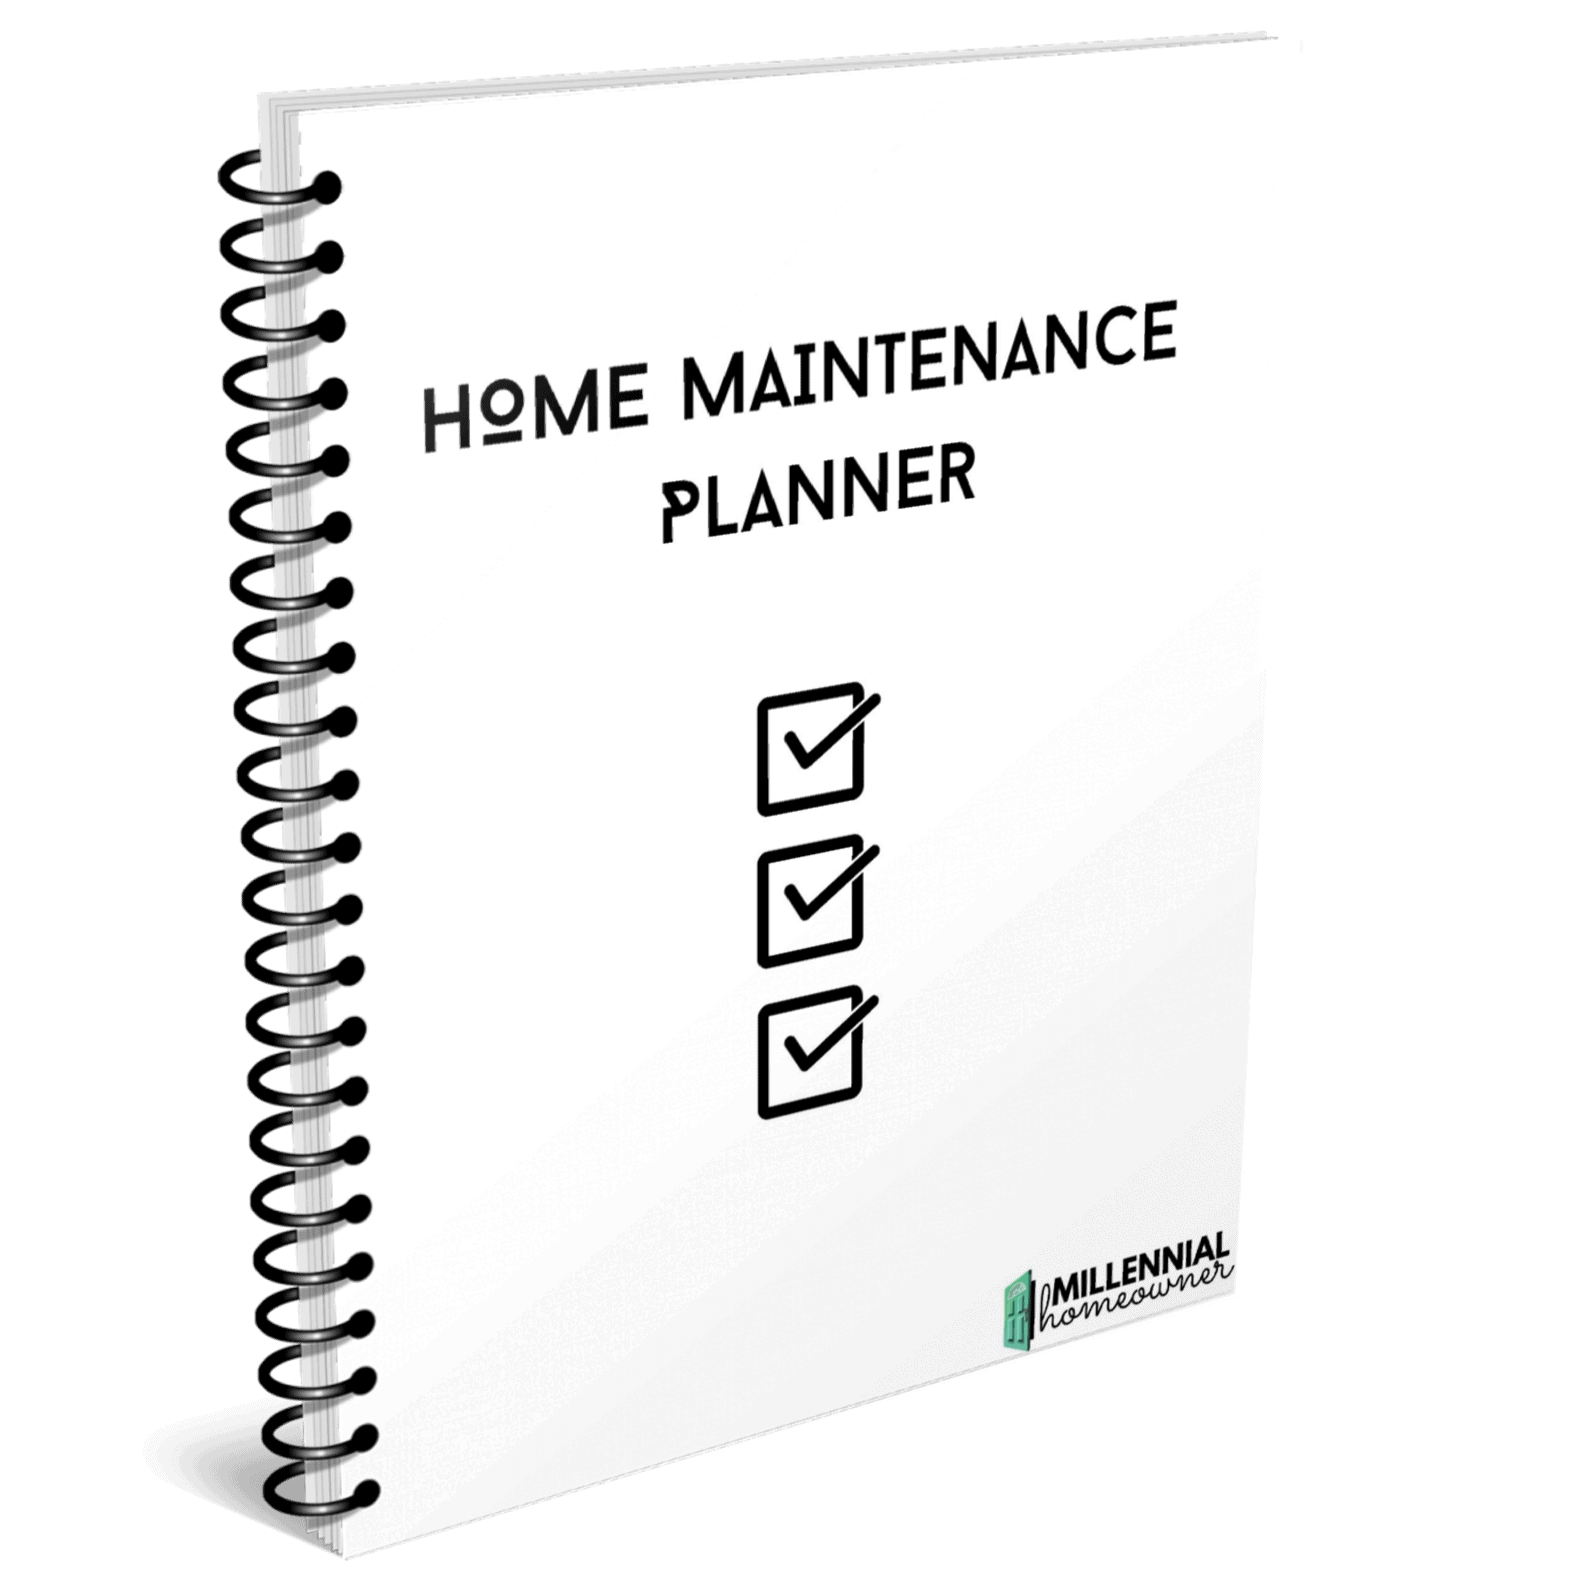 Home Maintenance Planner